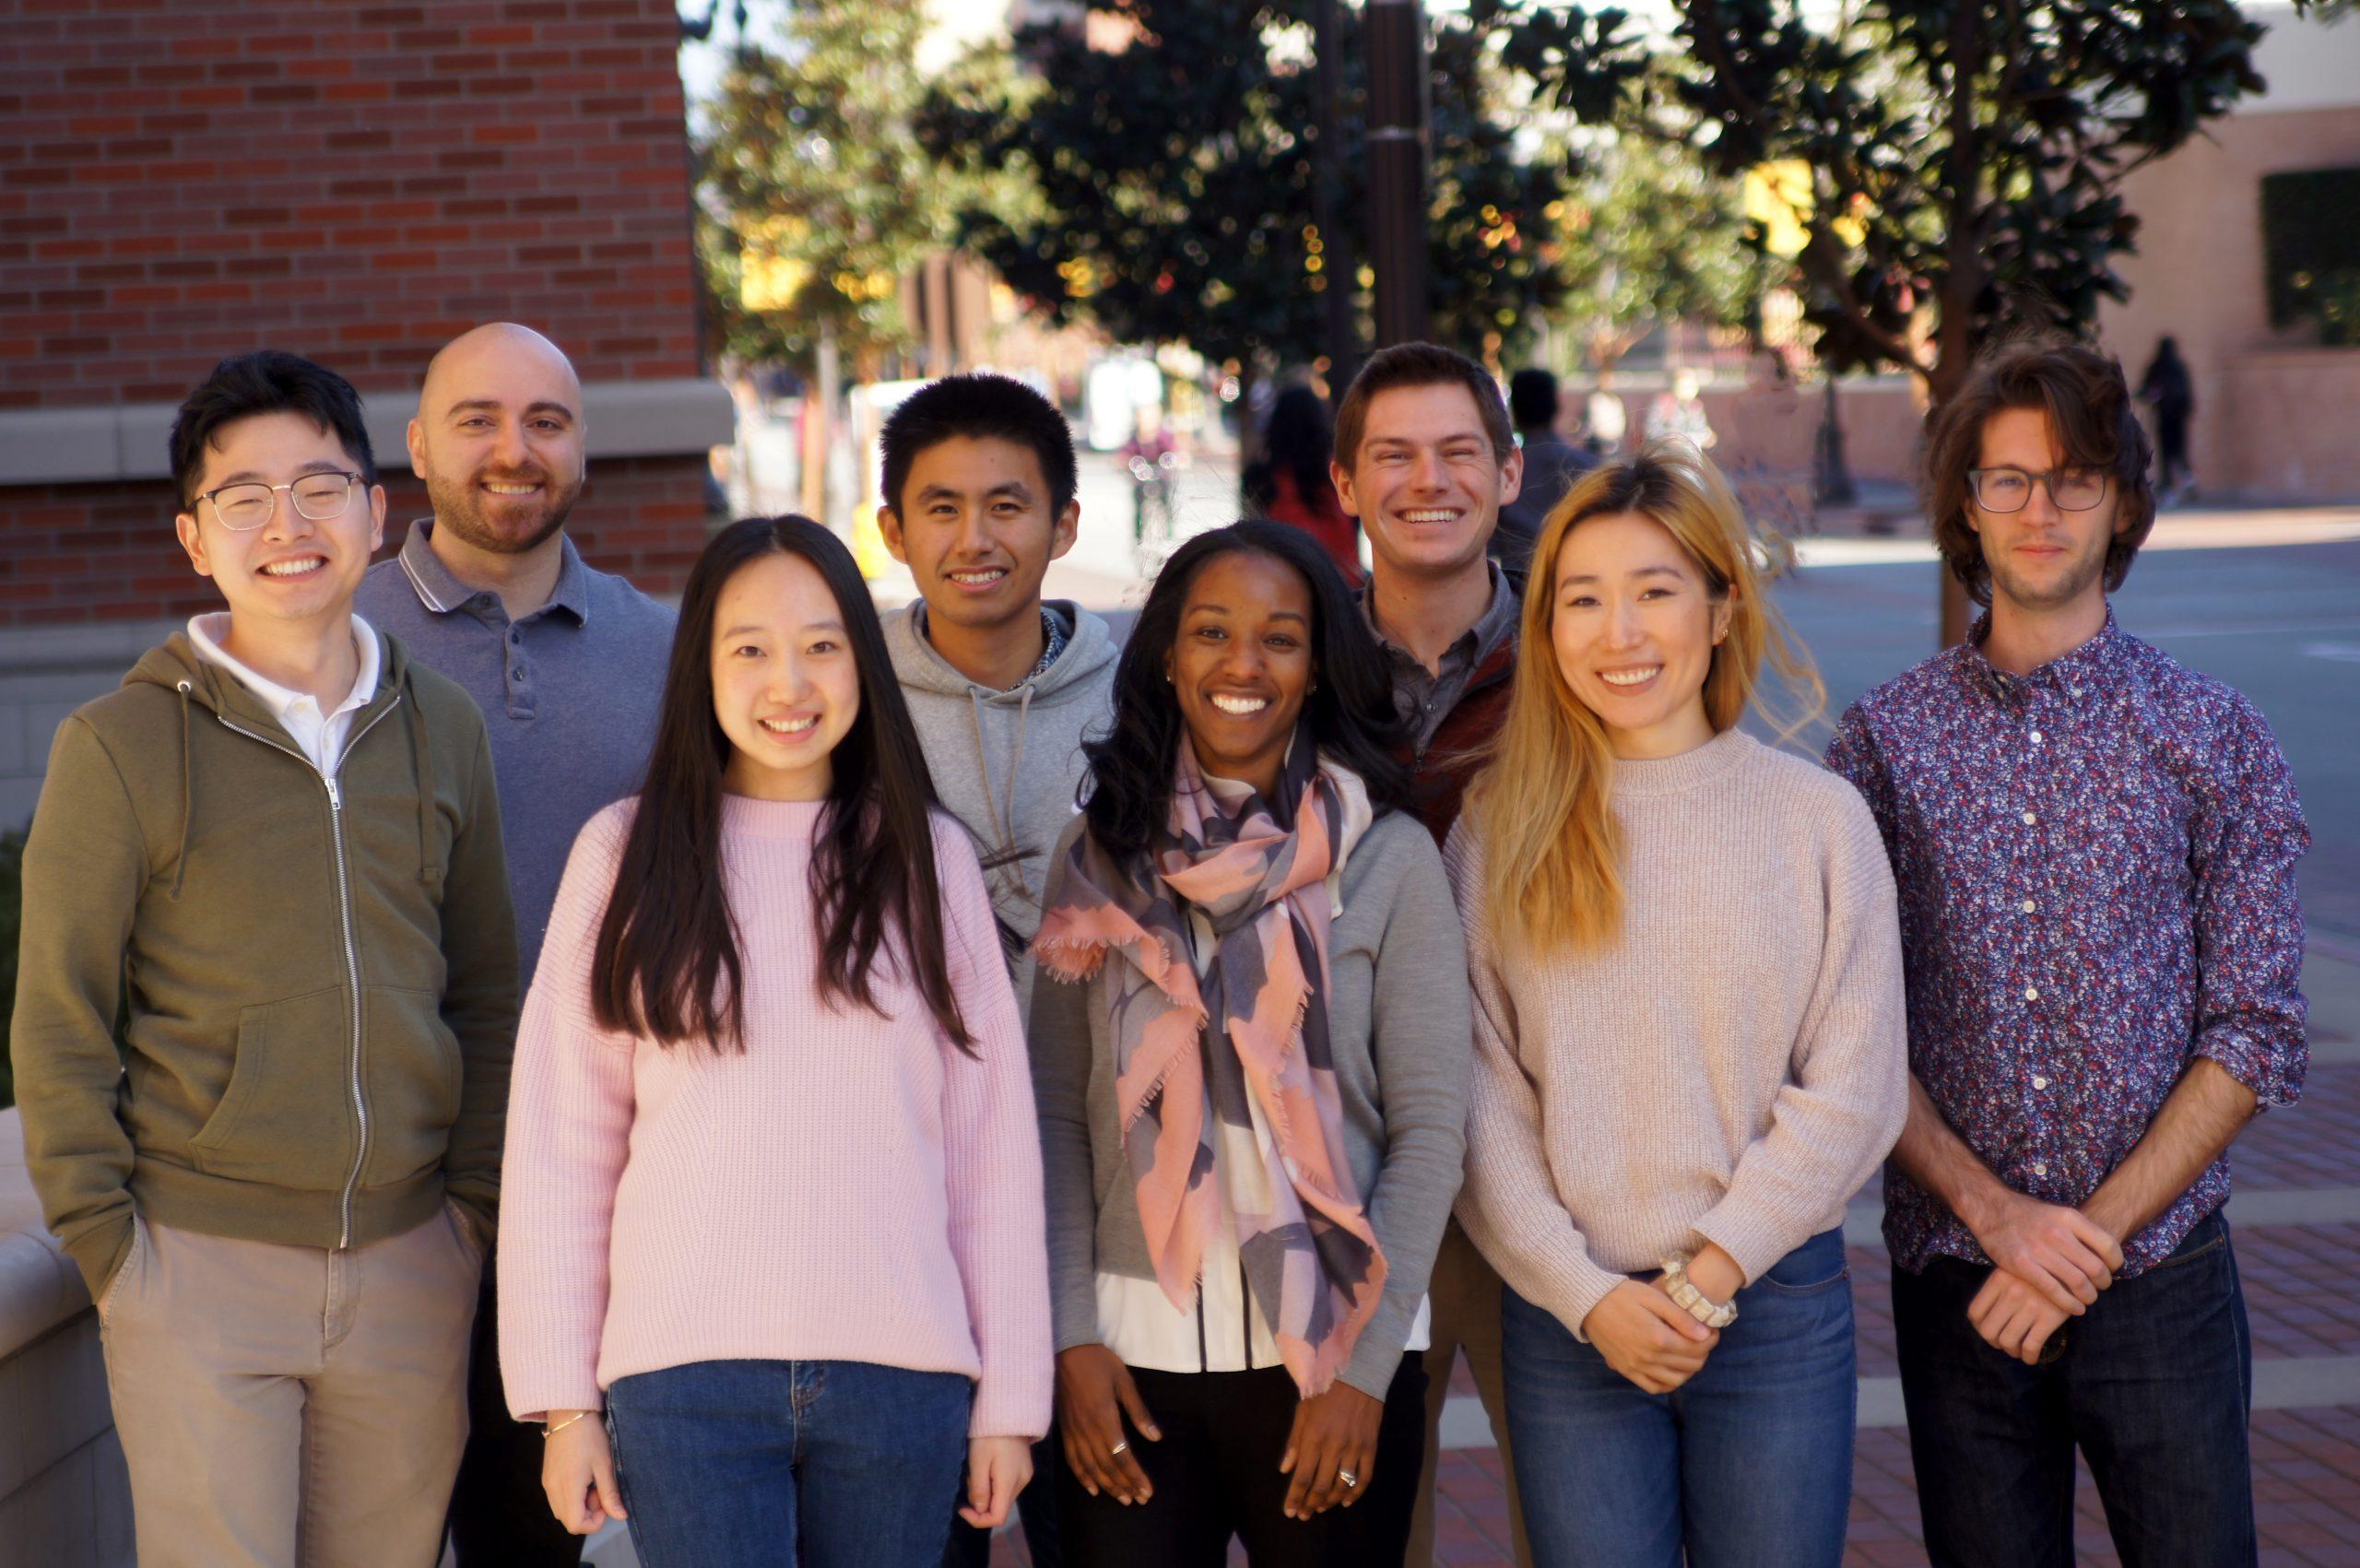 Group Photo - February 2020 - USC University Park Campus, Los Angeles, CA